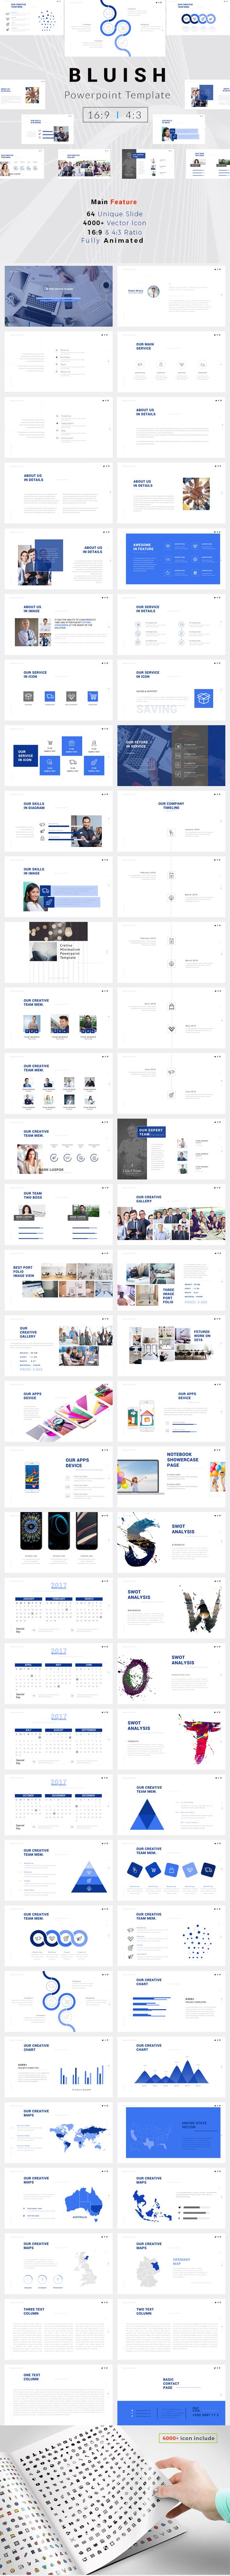 Bluish PowerPoint Template (PowerPoint Templates)